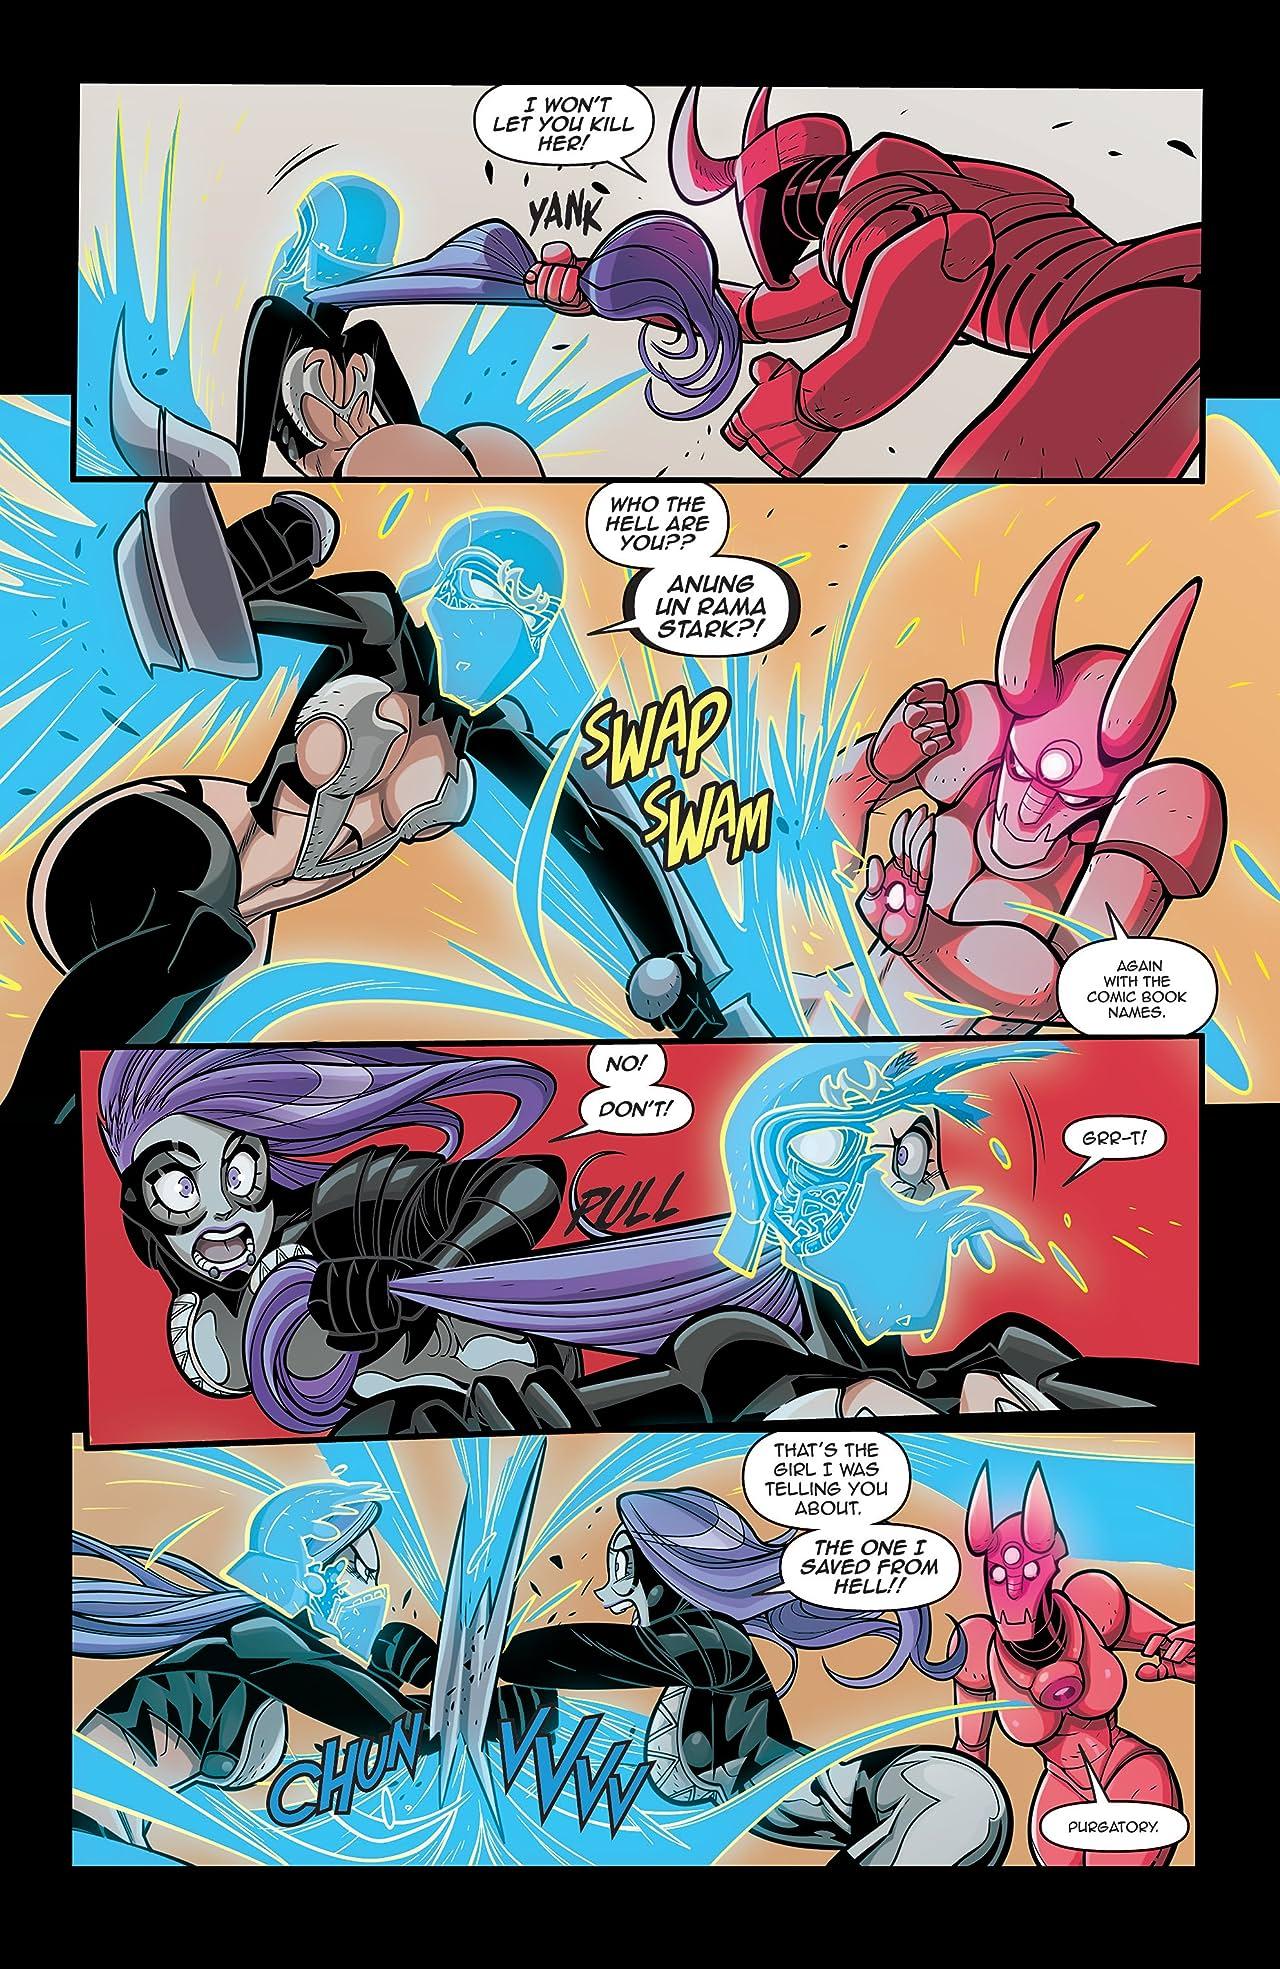 Vampblade Season 3 #12